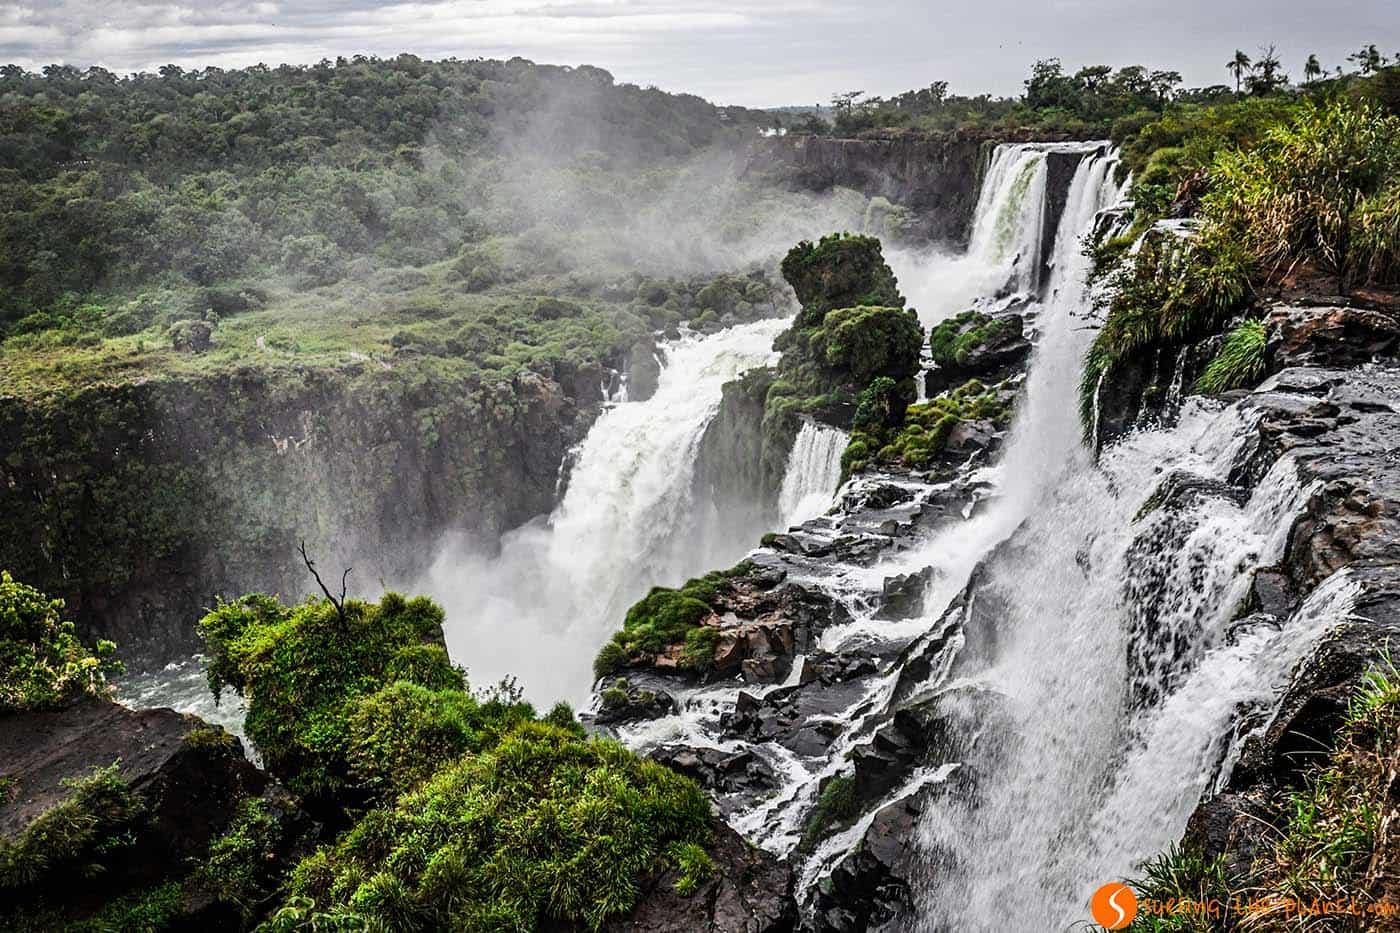 Le cascate di iguazù dalla parte brasiliana